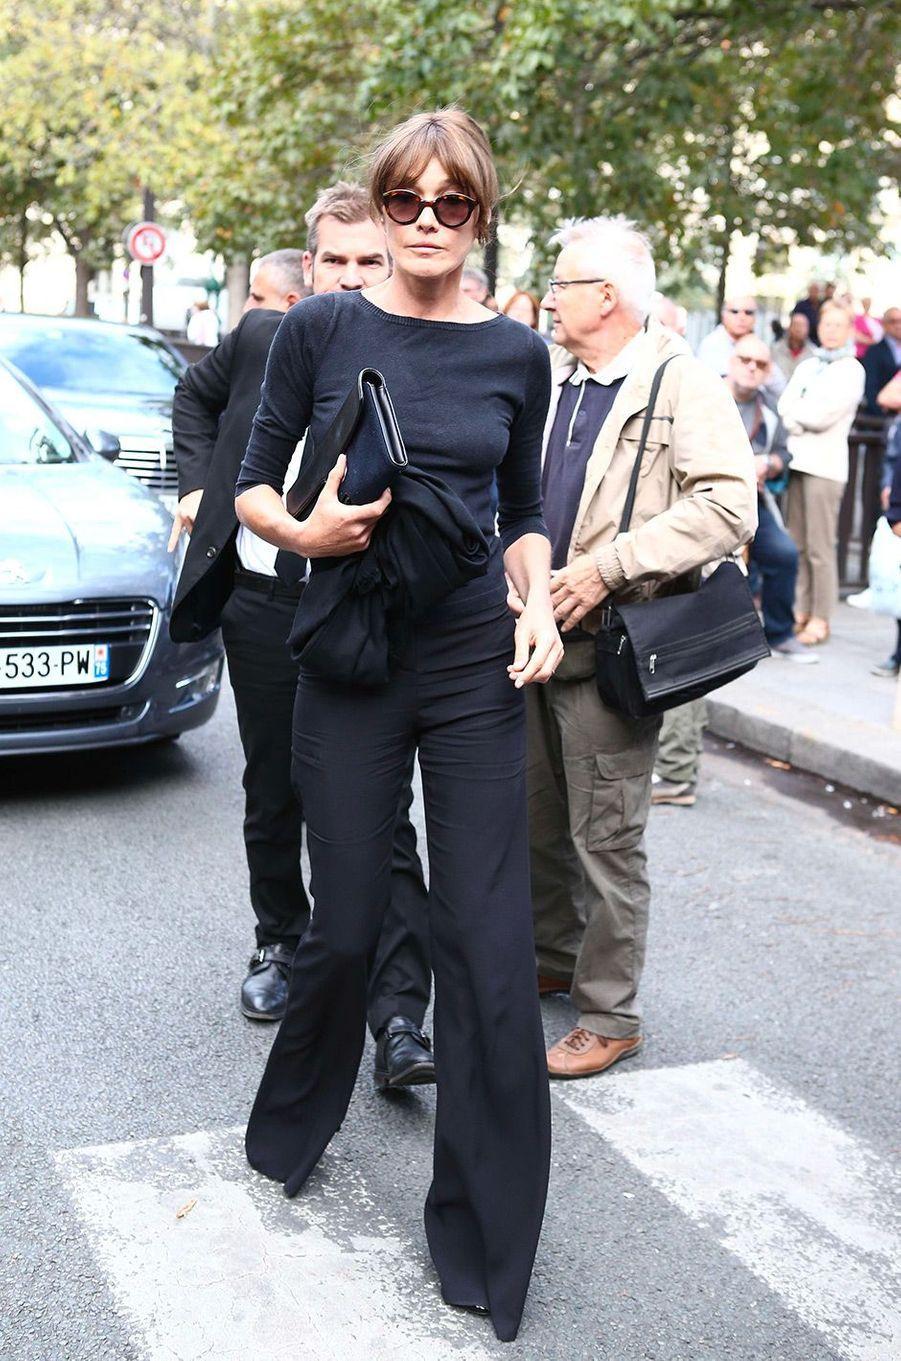 Carla Bruni-Sarkozy